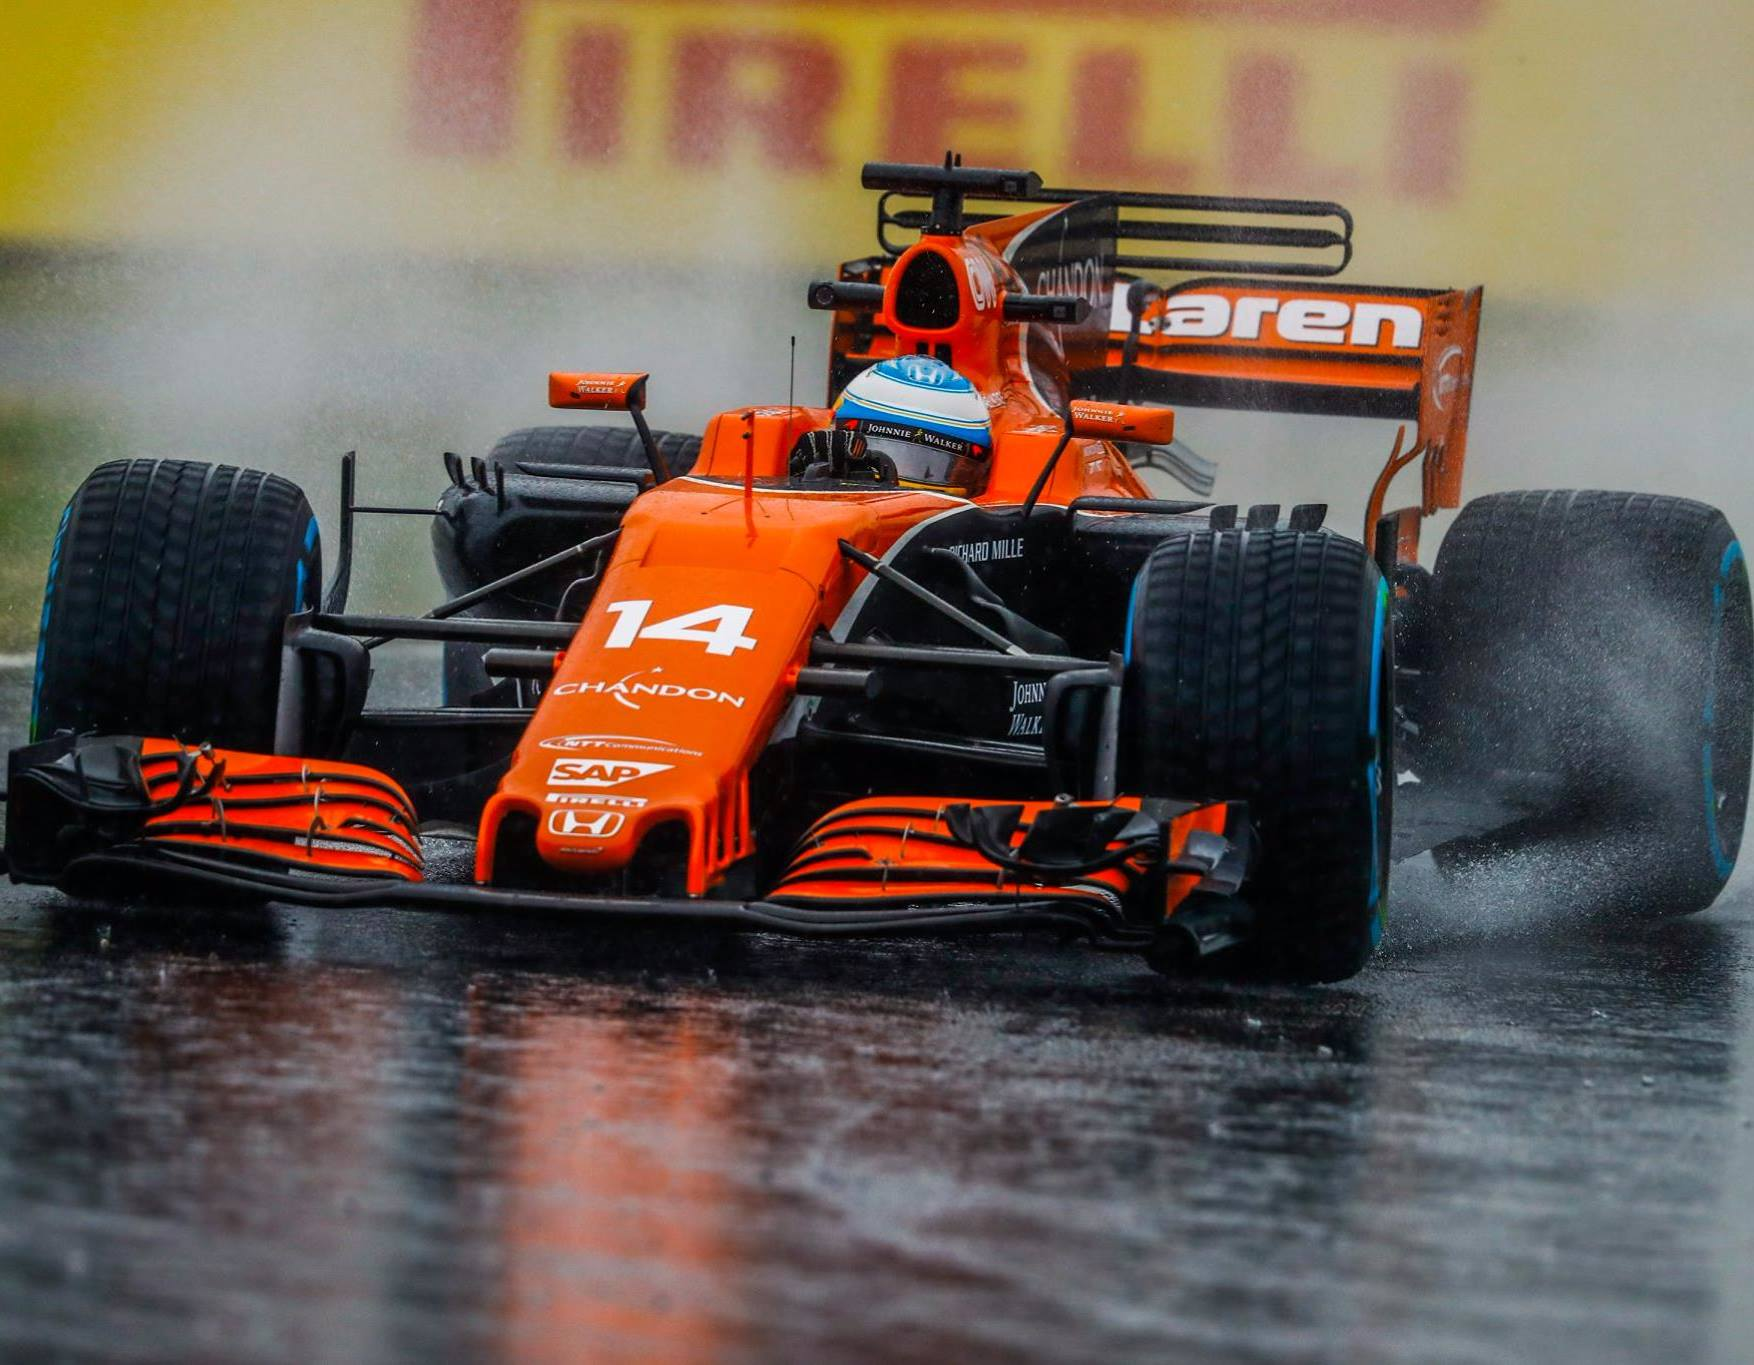 Fernando Alonso - McLaren F1